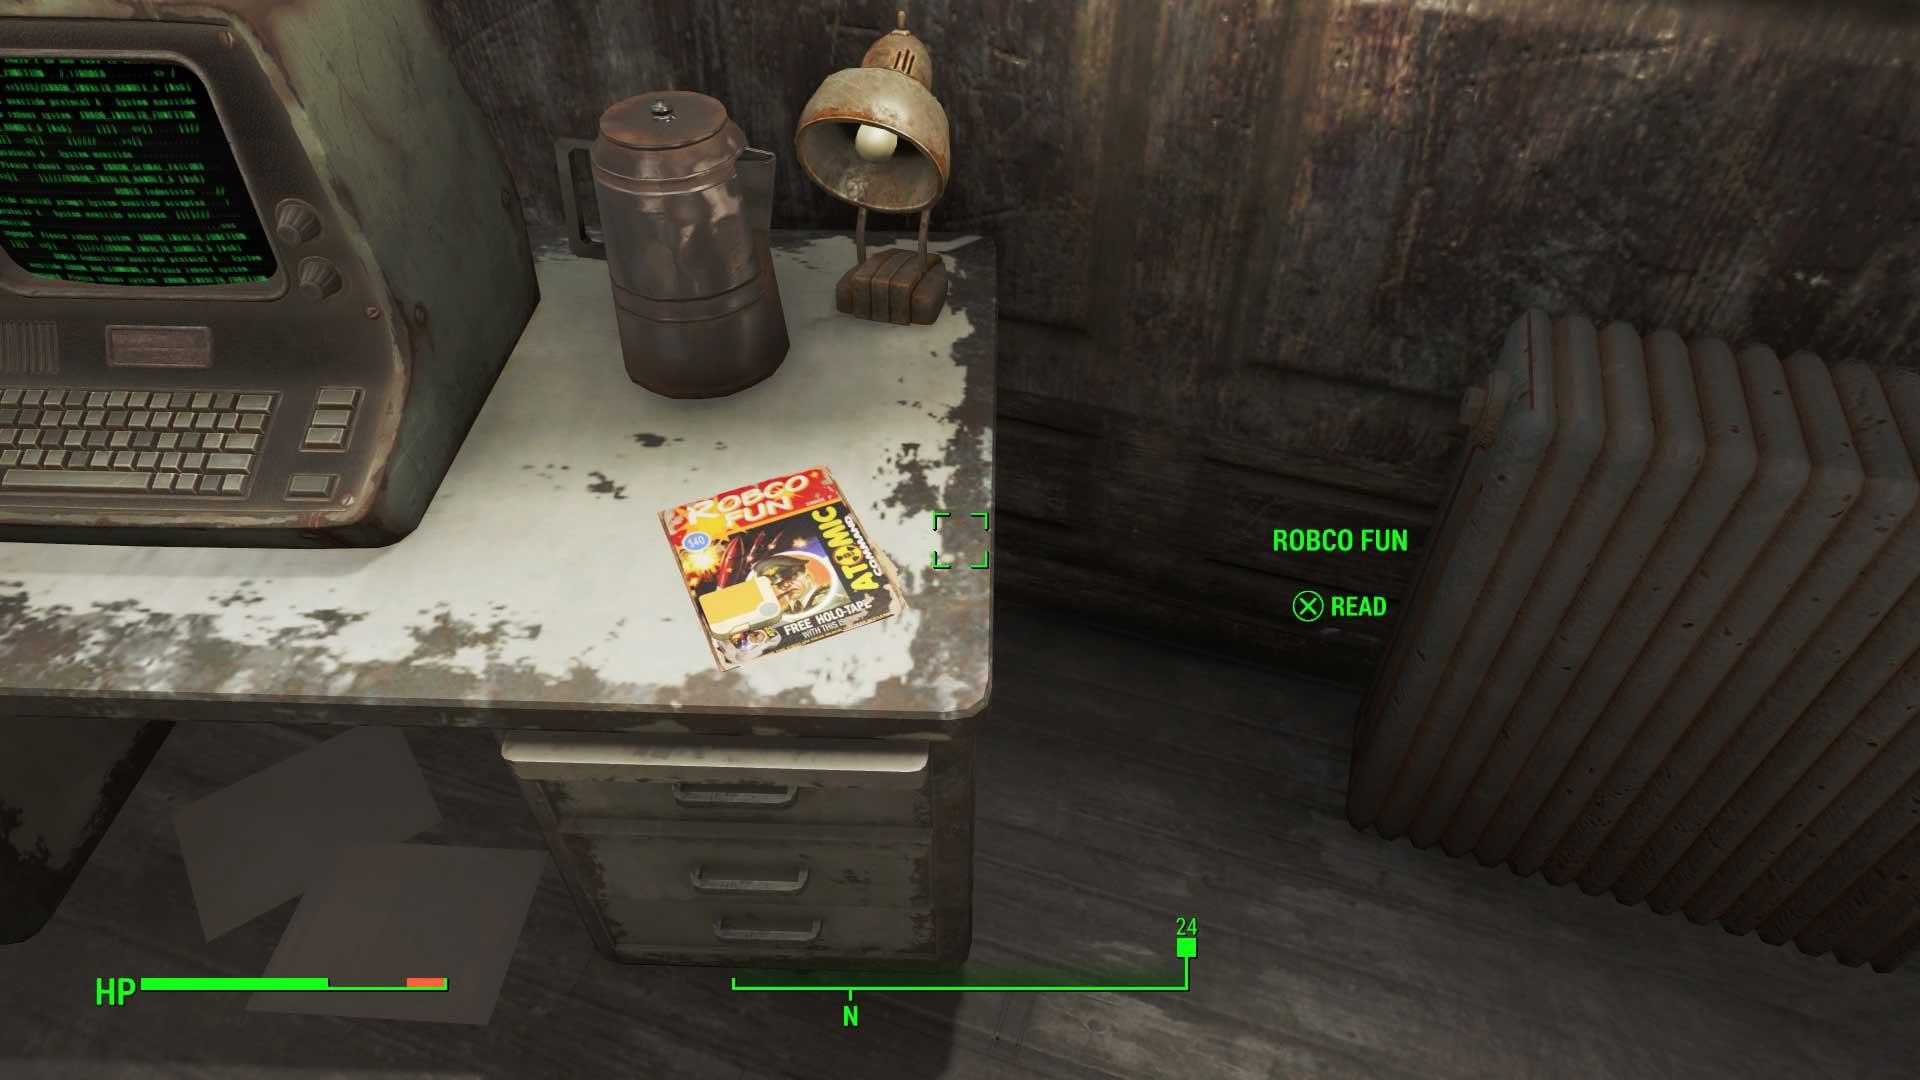 Fallout 4 Sim Settlements Mod Not Working - The Best